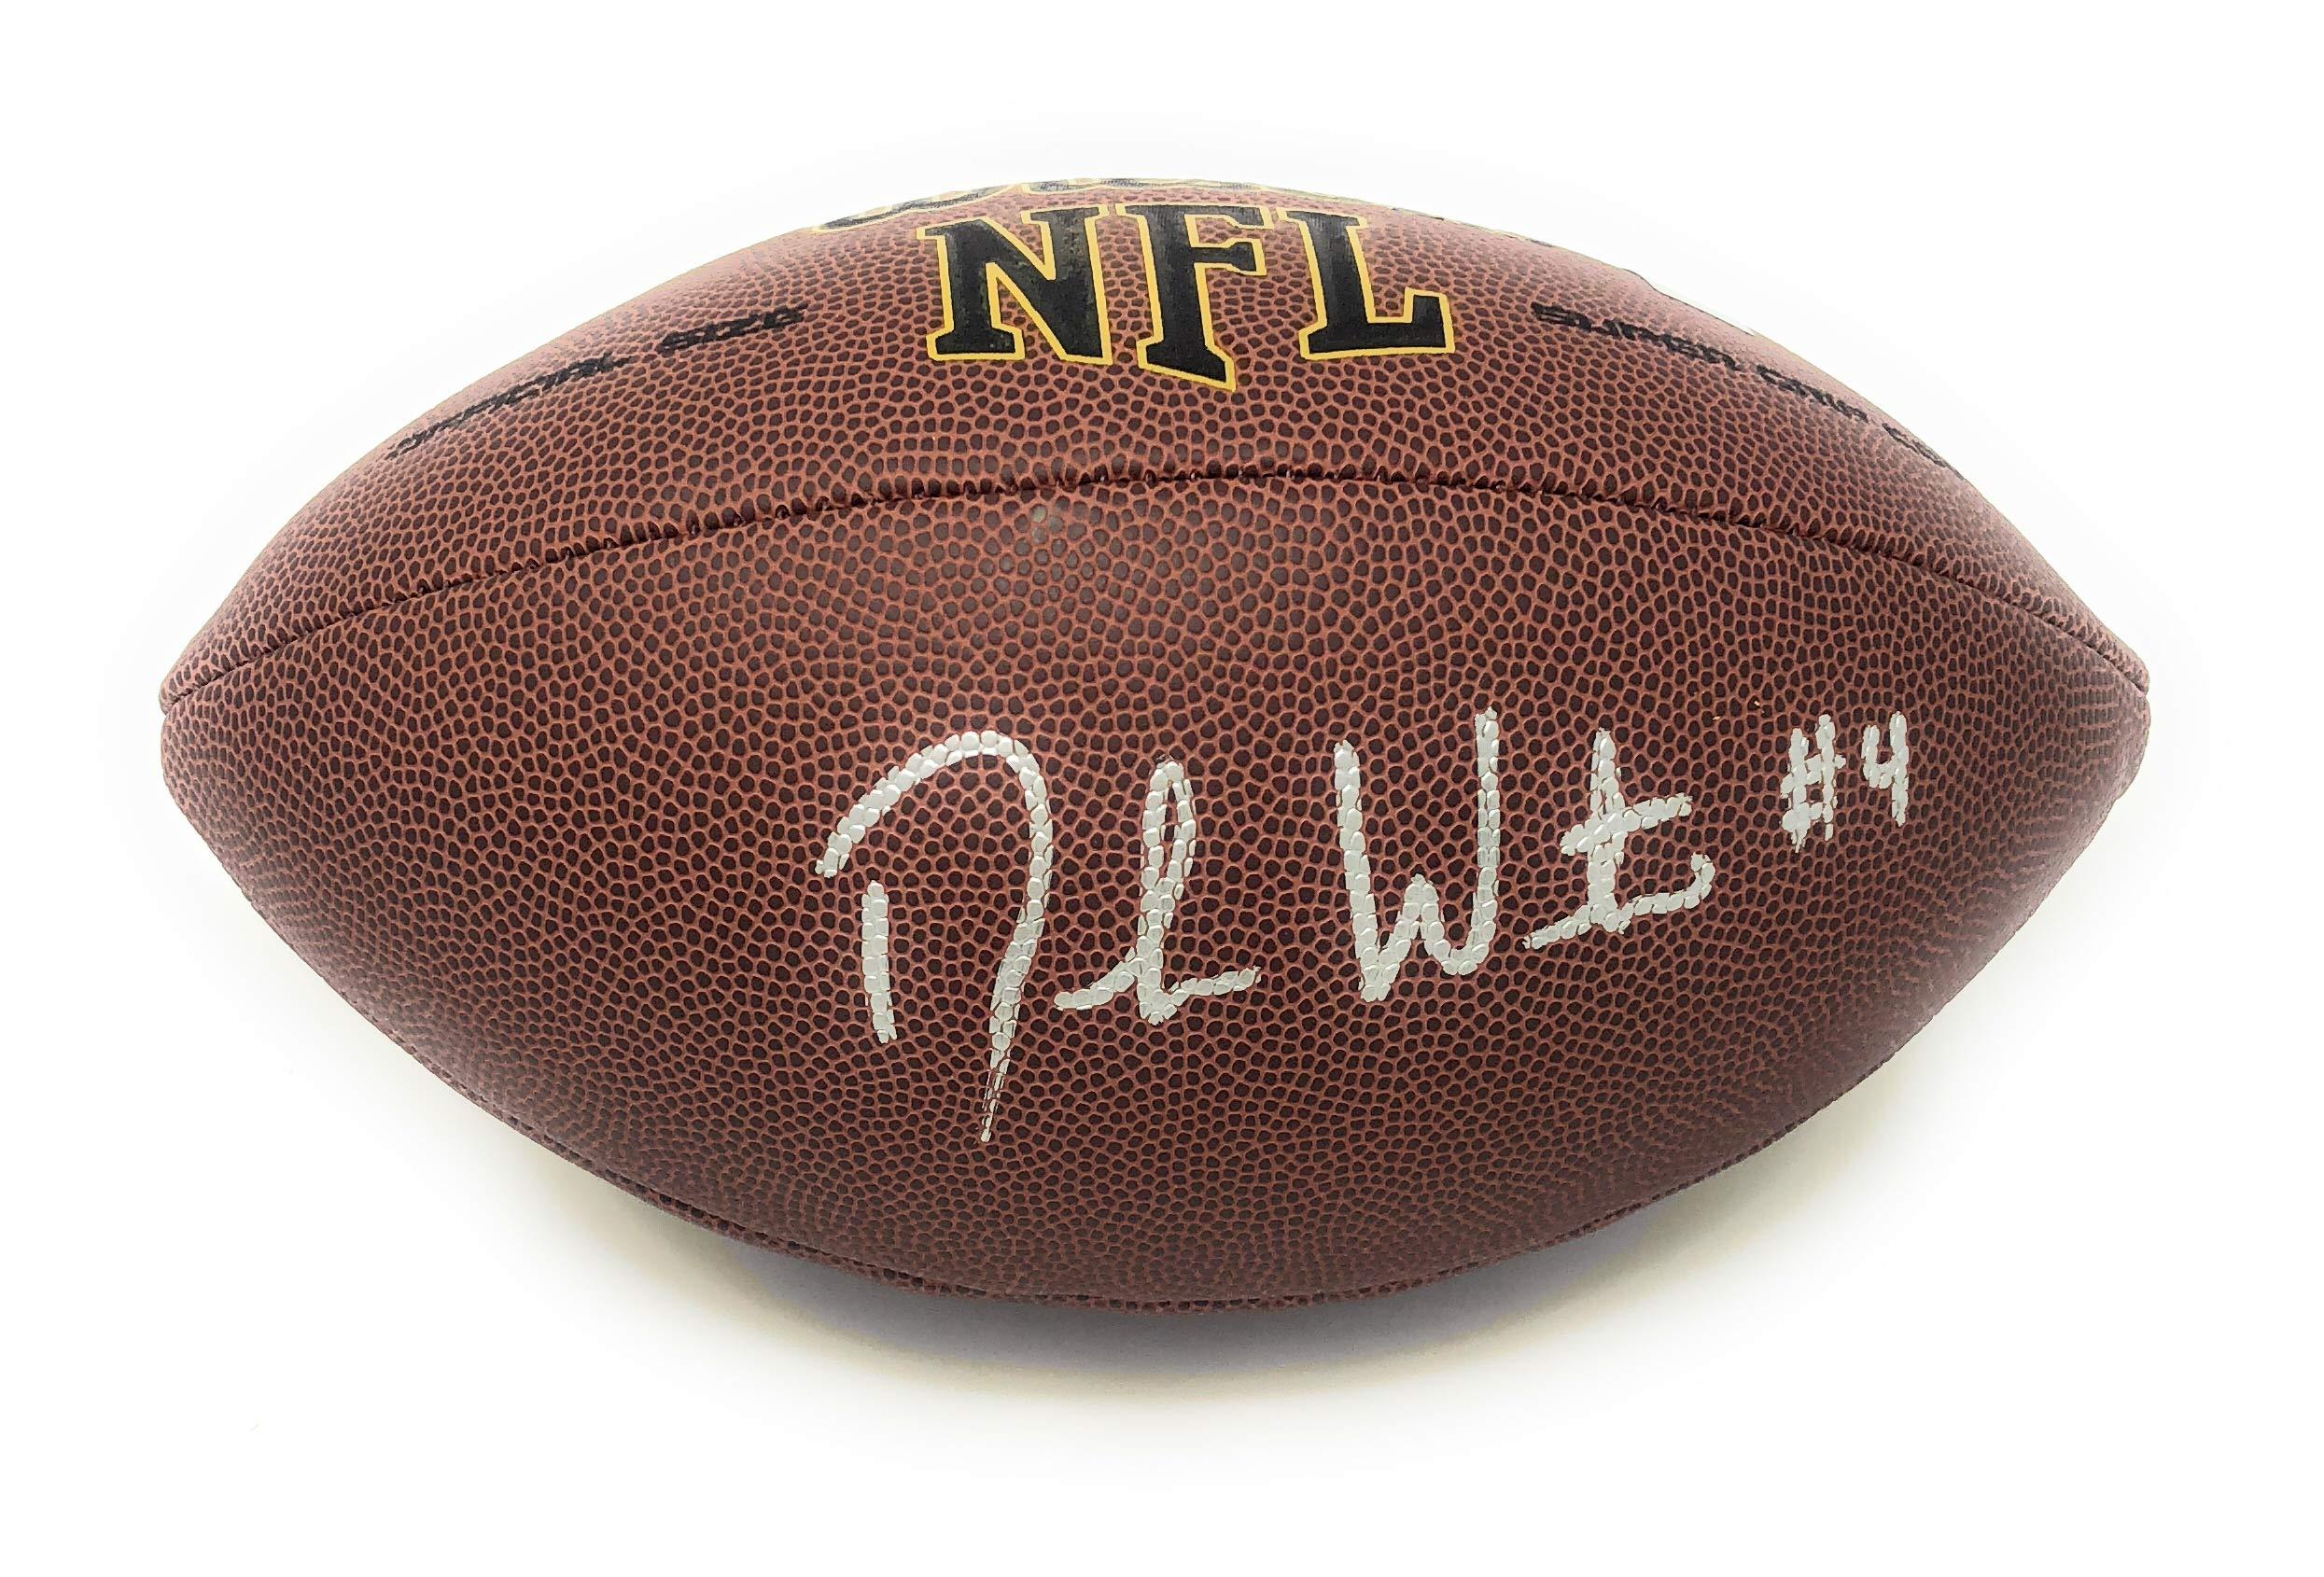 Deshaun Watson Houston Texans Signed Autograph NFL Football Watson GTSM Player Hologram